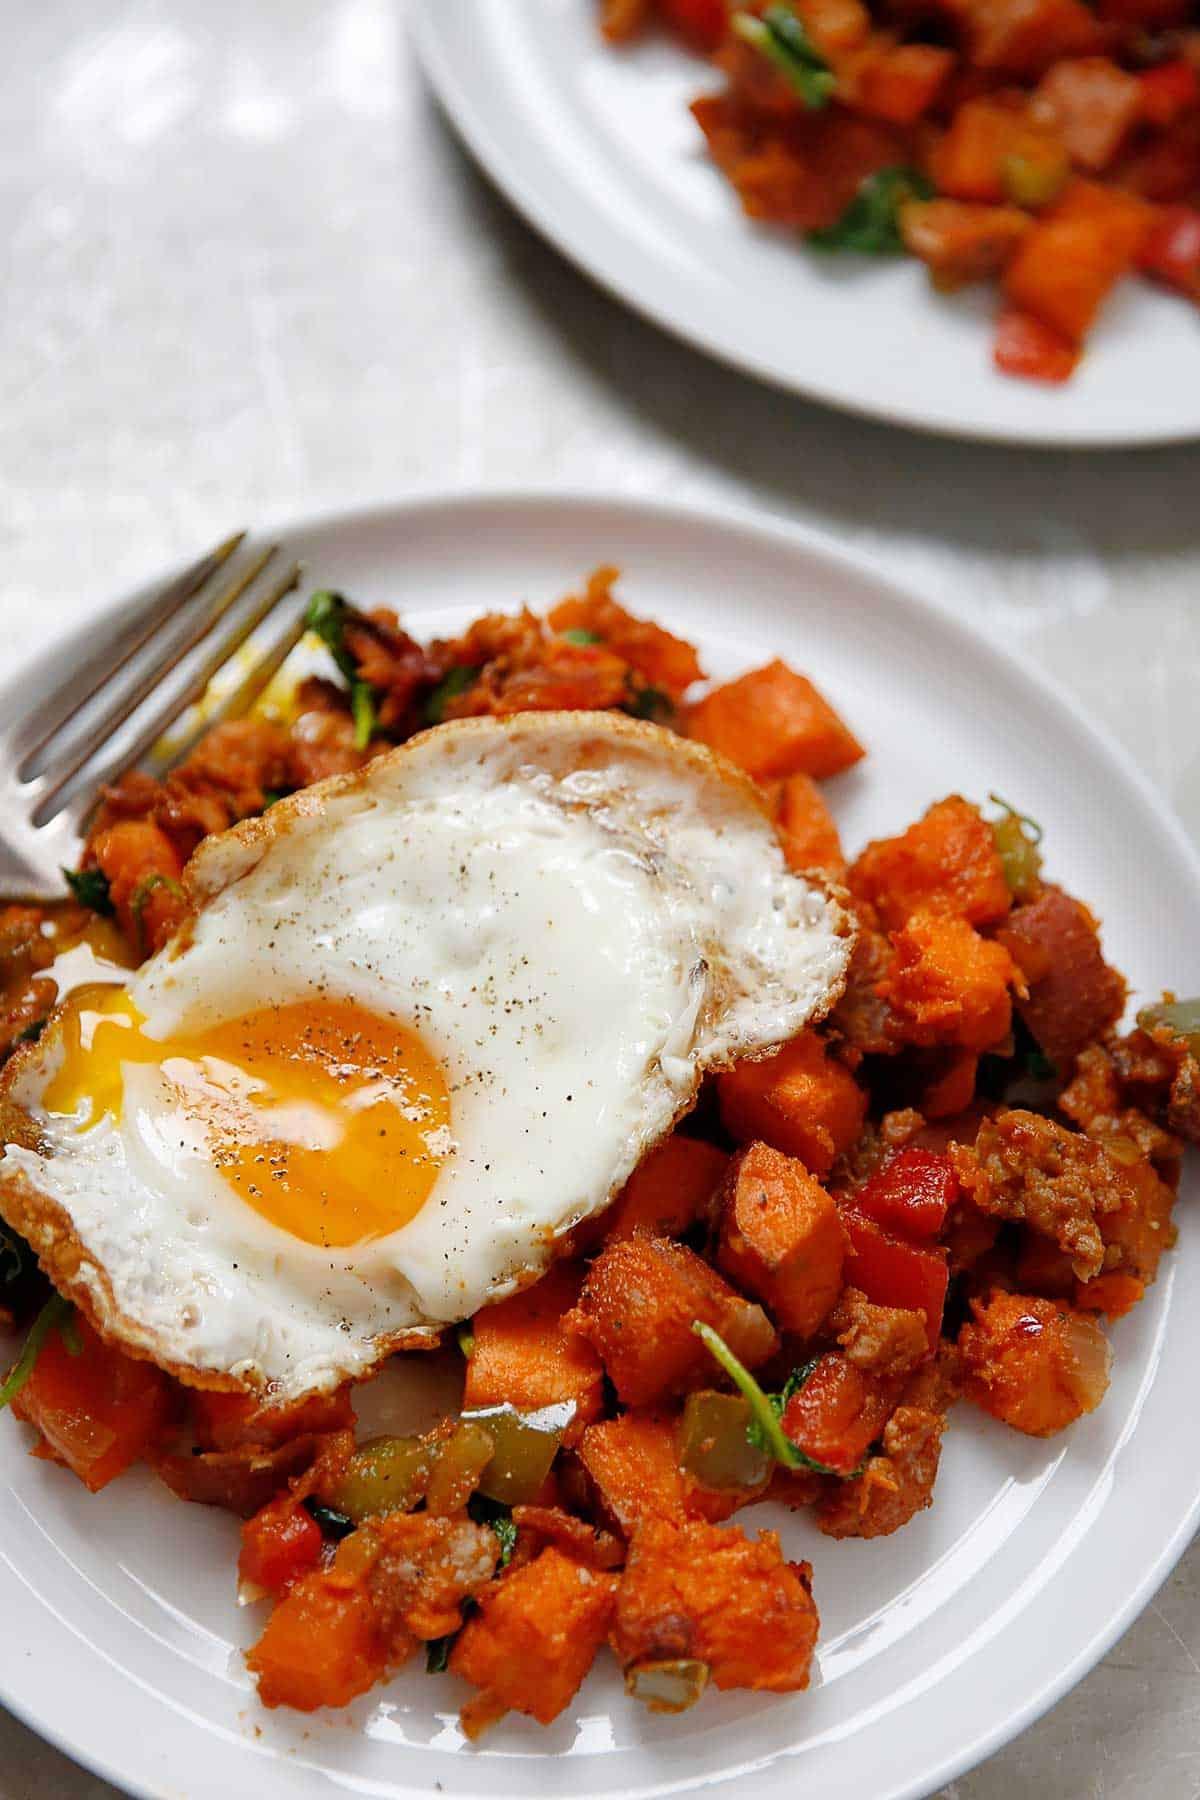 Loaded Paleo Breakfast Hash | Lexi's Clean Kitchen